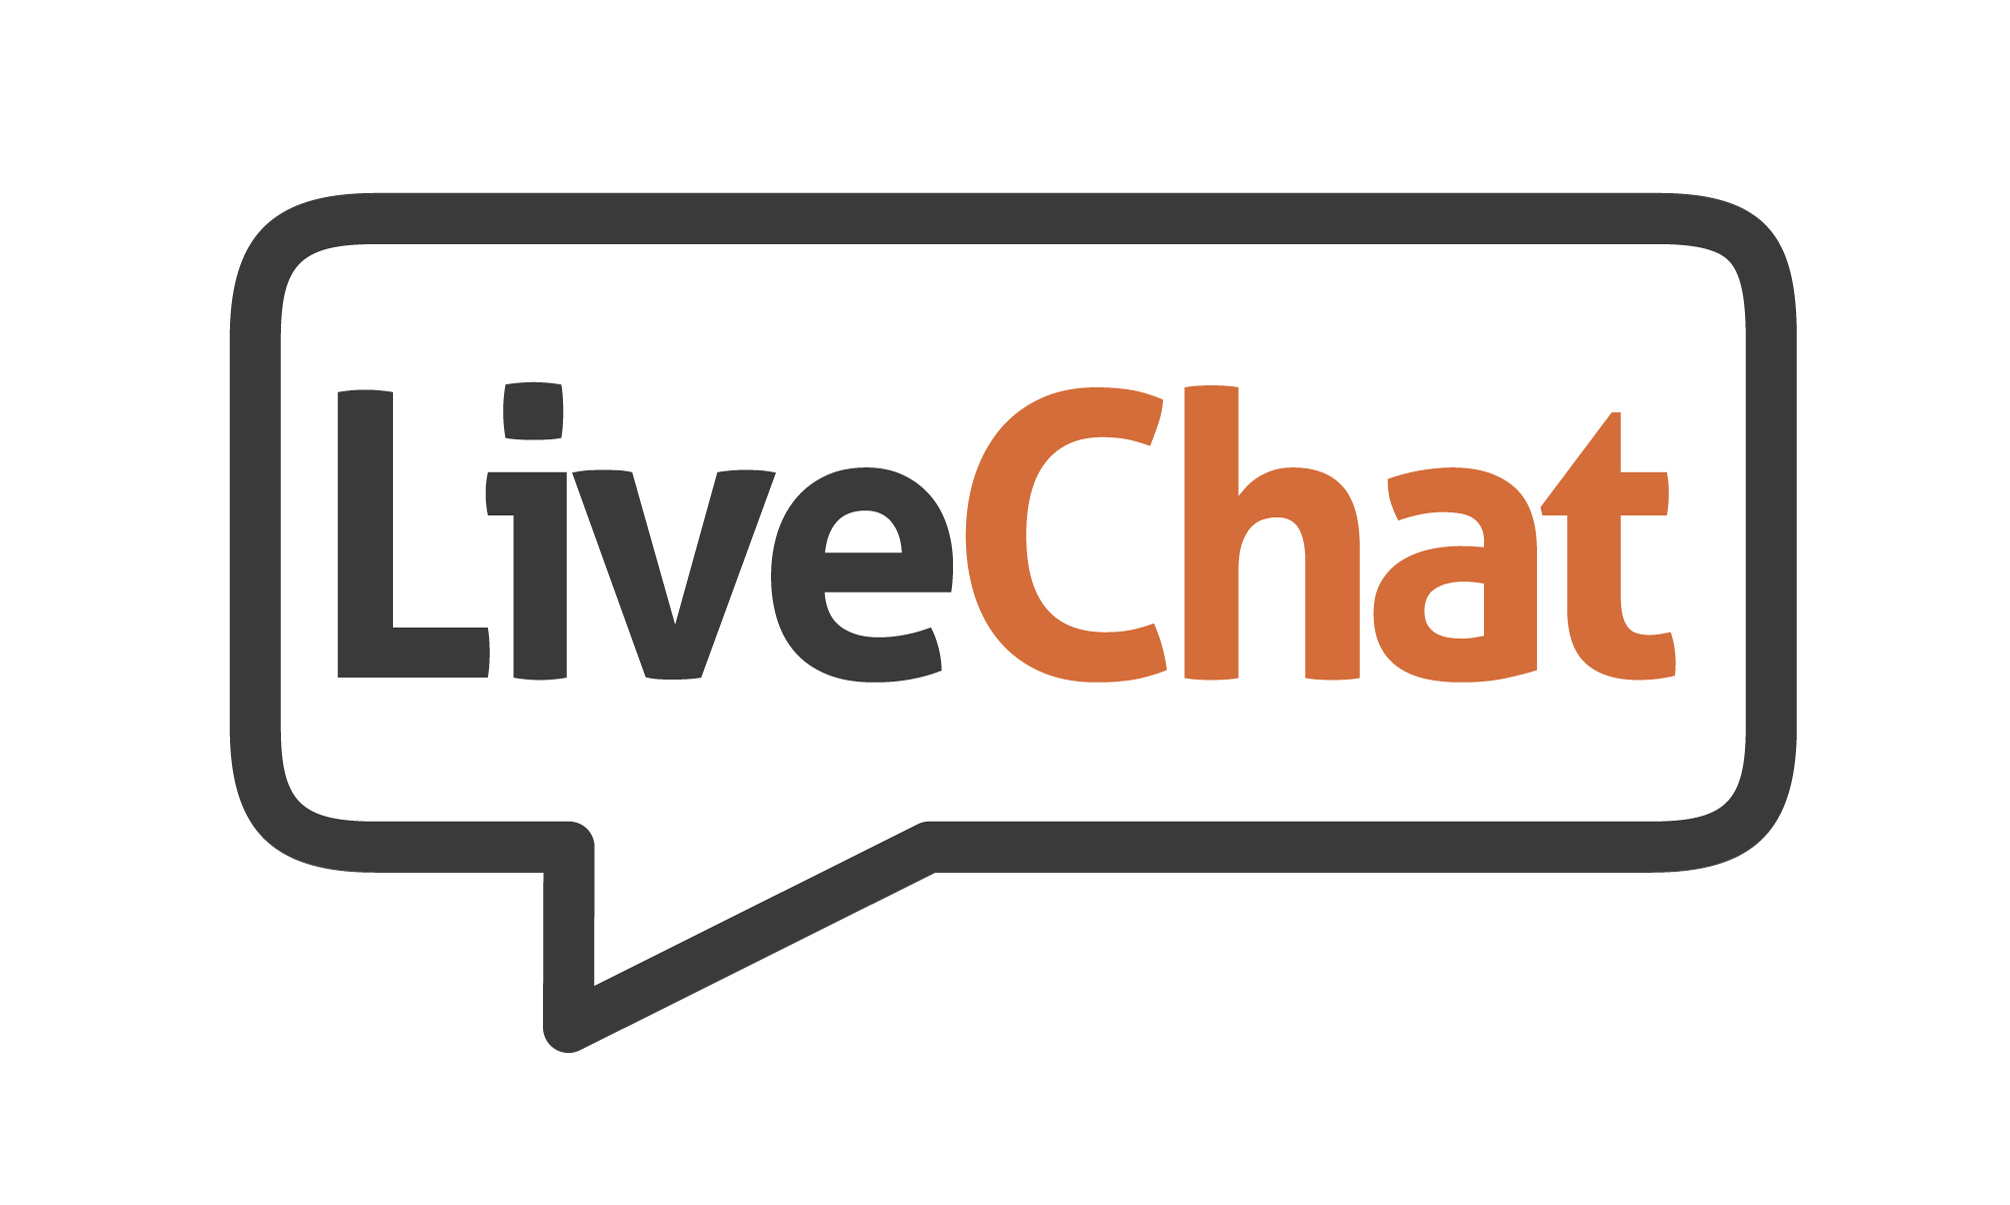 https://cdnx.livechatinc.com/investorpl/uploads/2014/03/livechat_logo_2010x1205.jpg